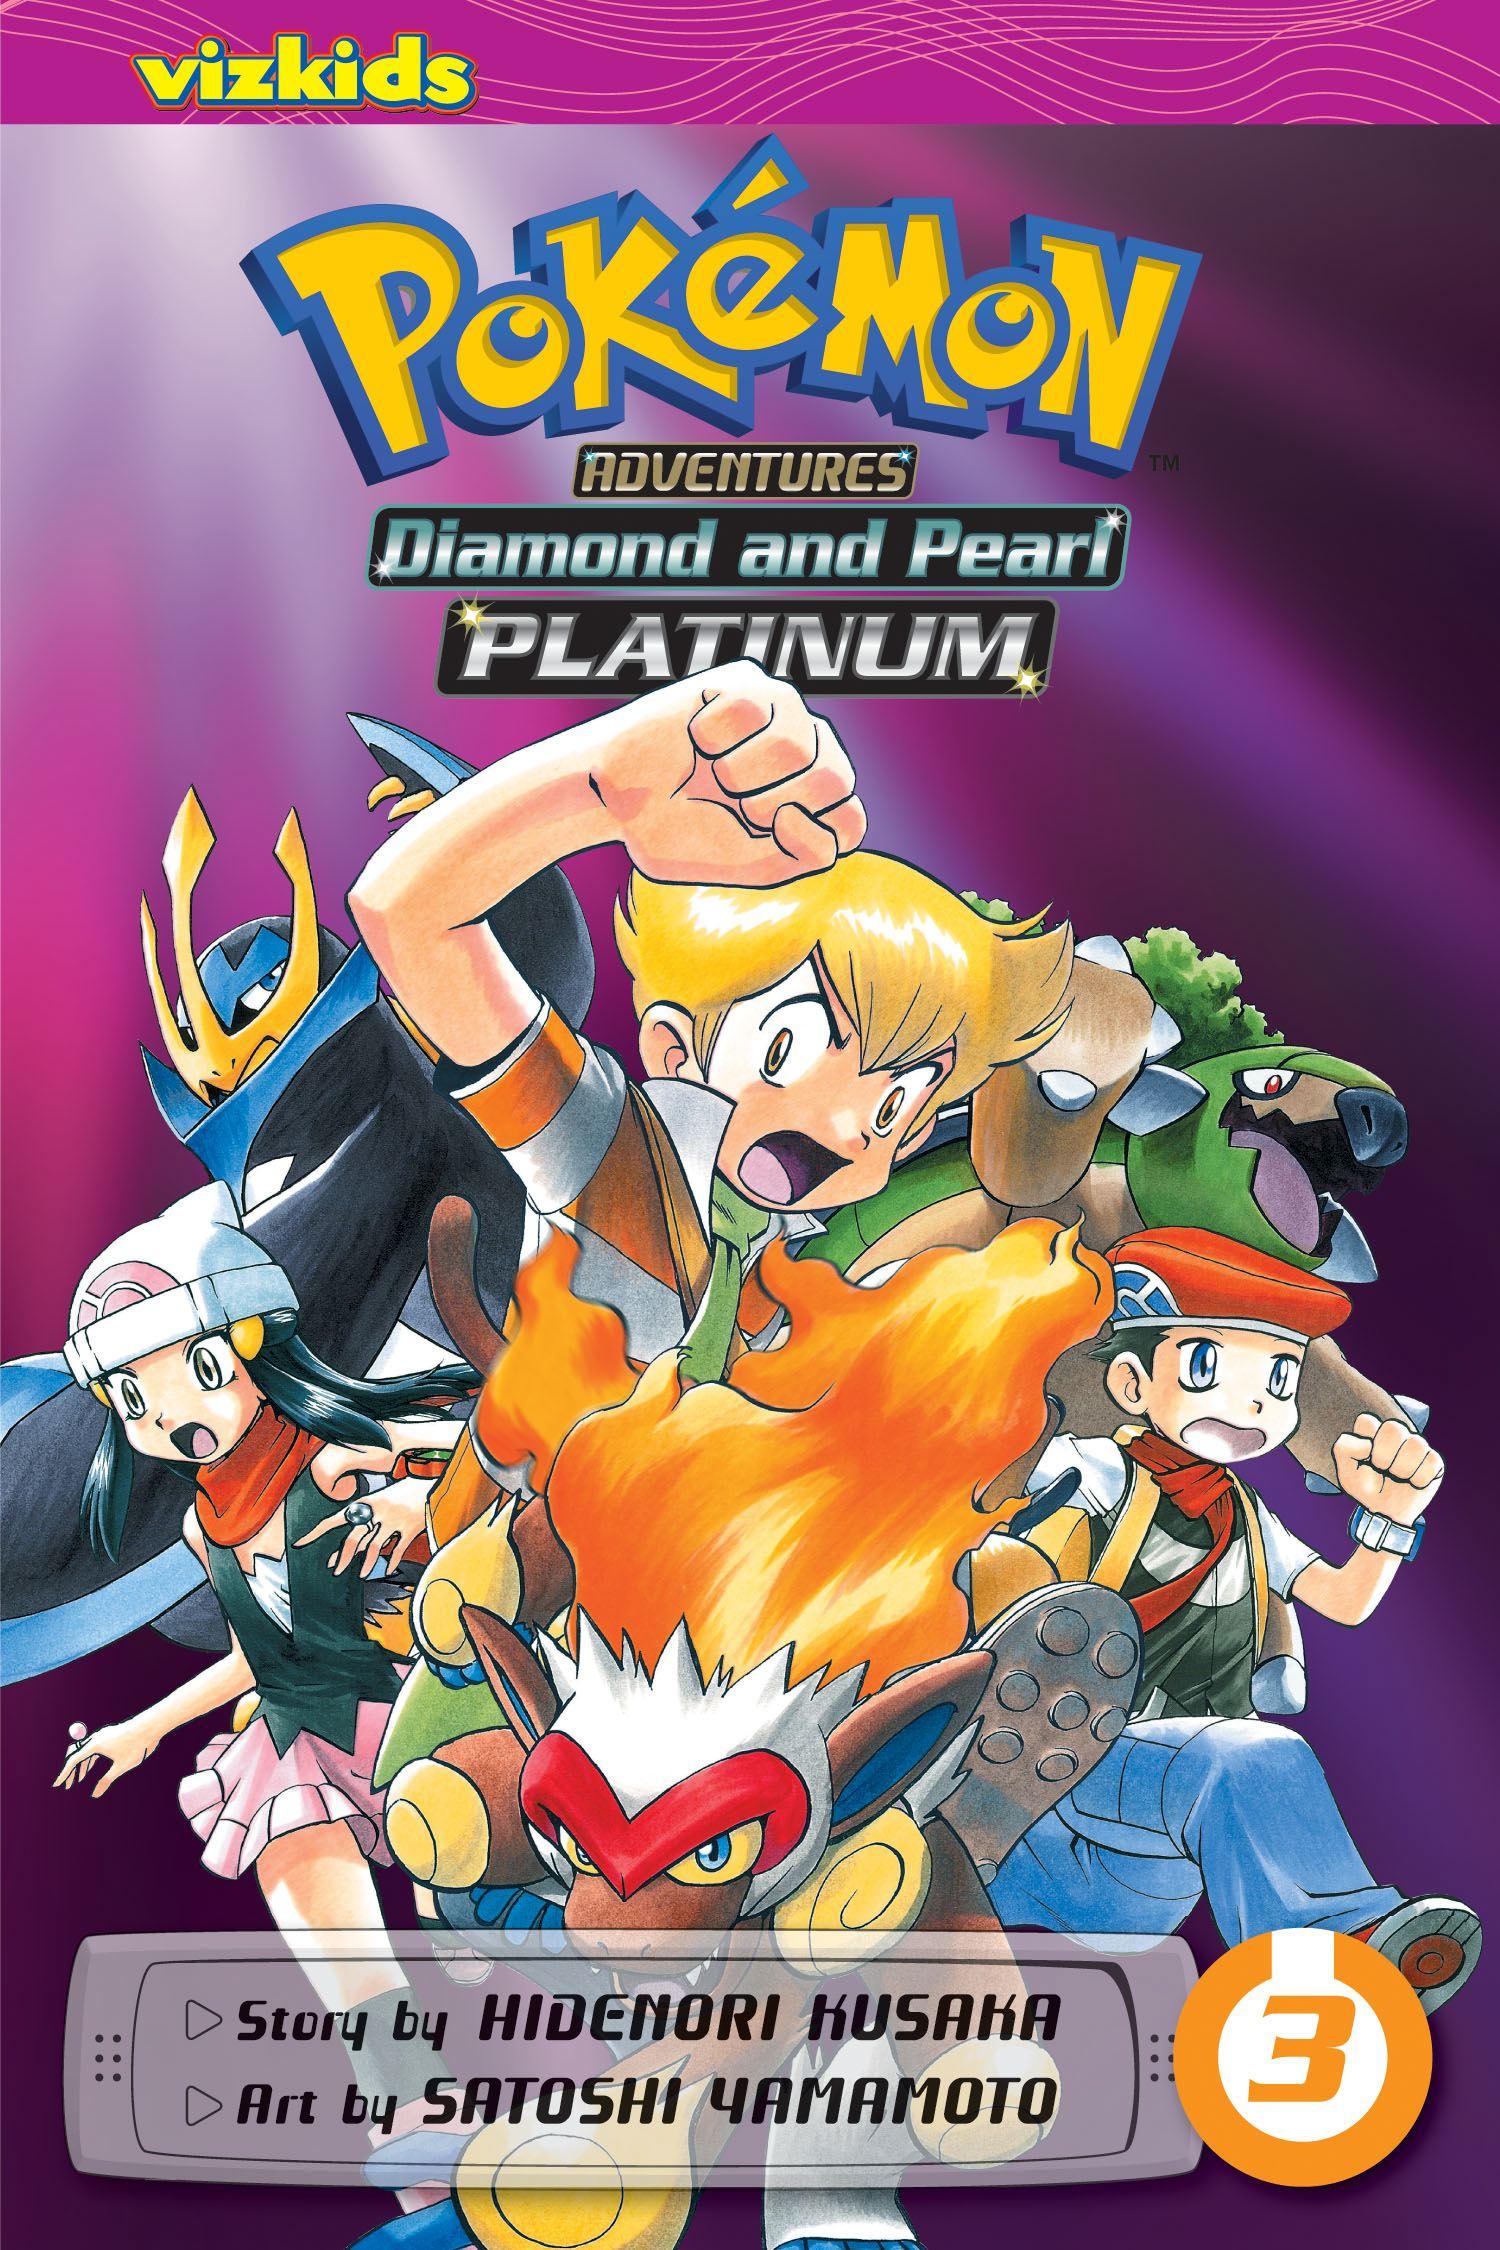 pok233mon adventures diamond and pearlplatinum vol 3